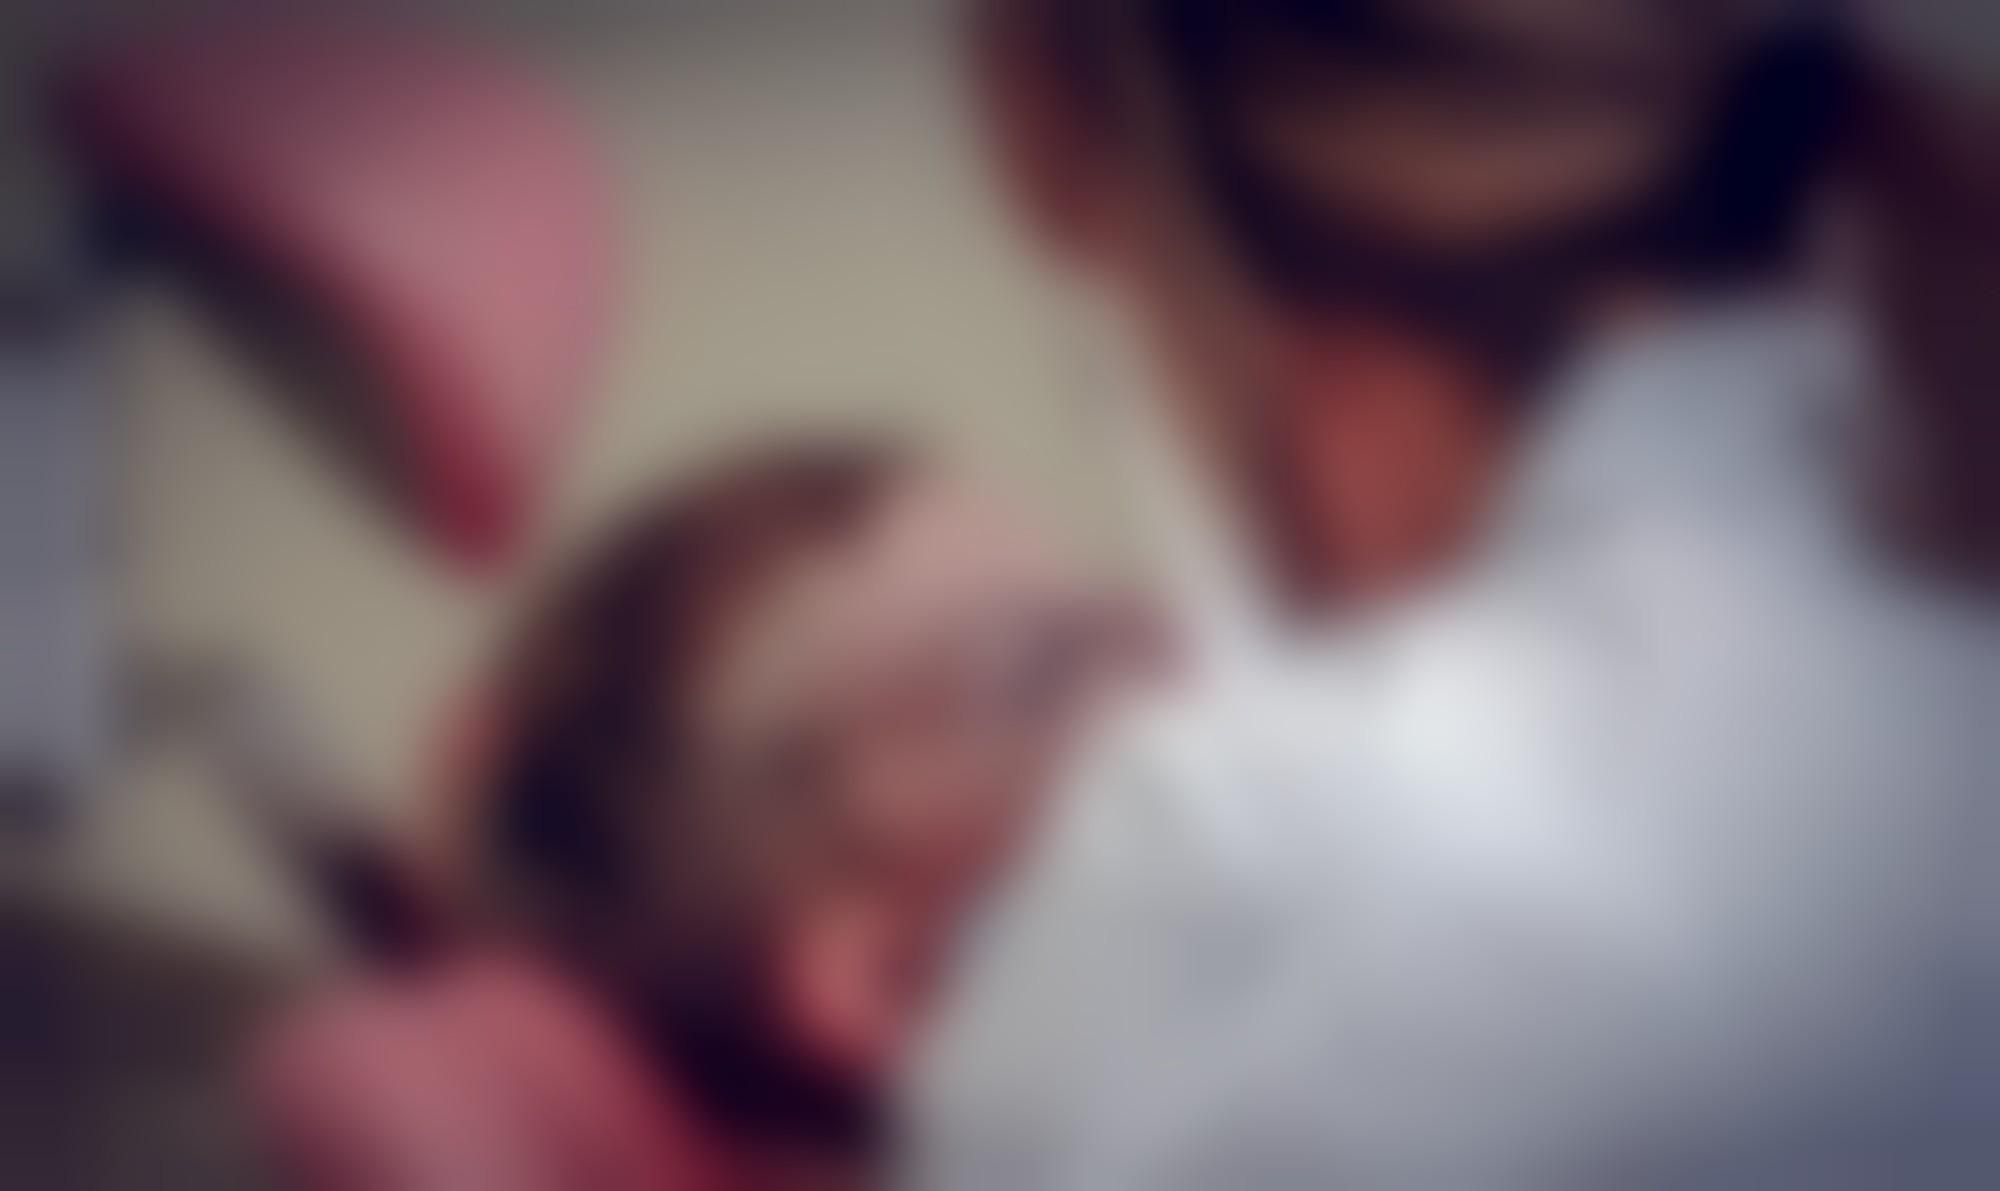 DentistLandingPageBanner-Blur.jpg